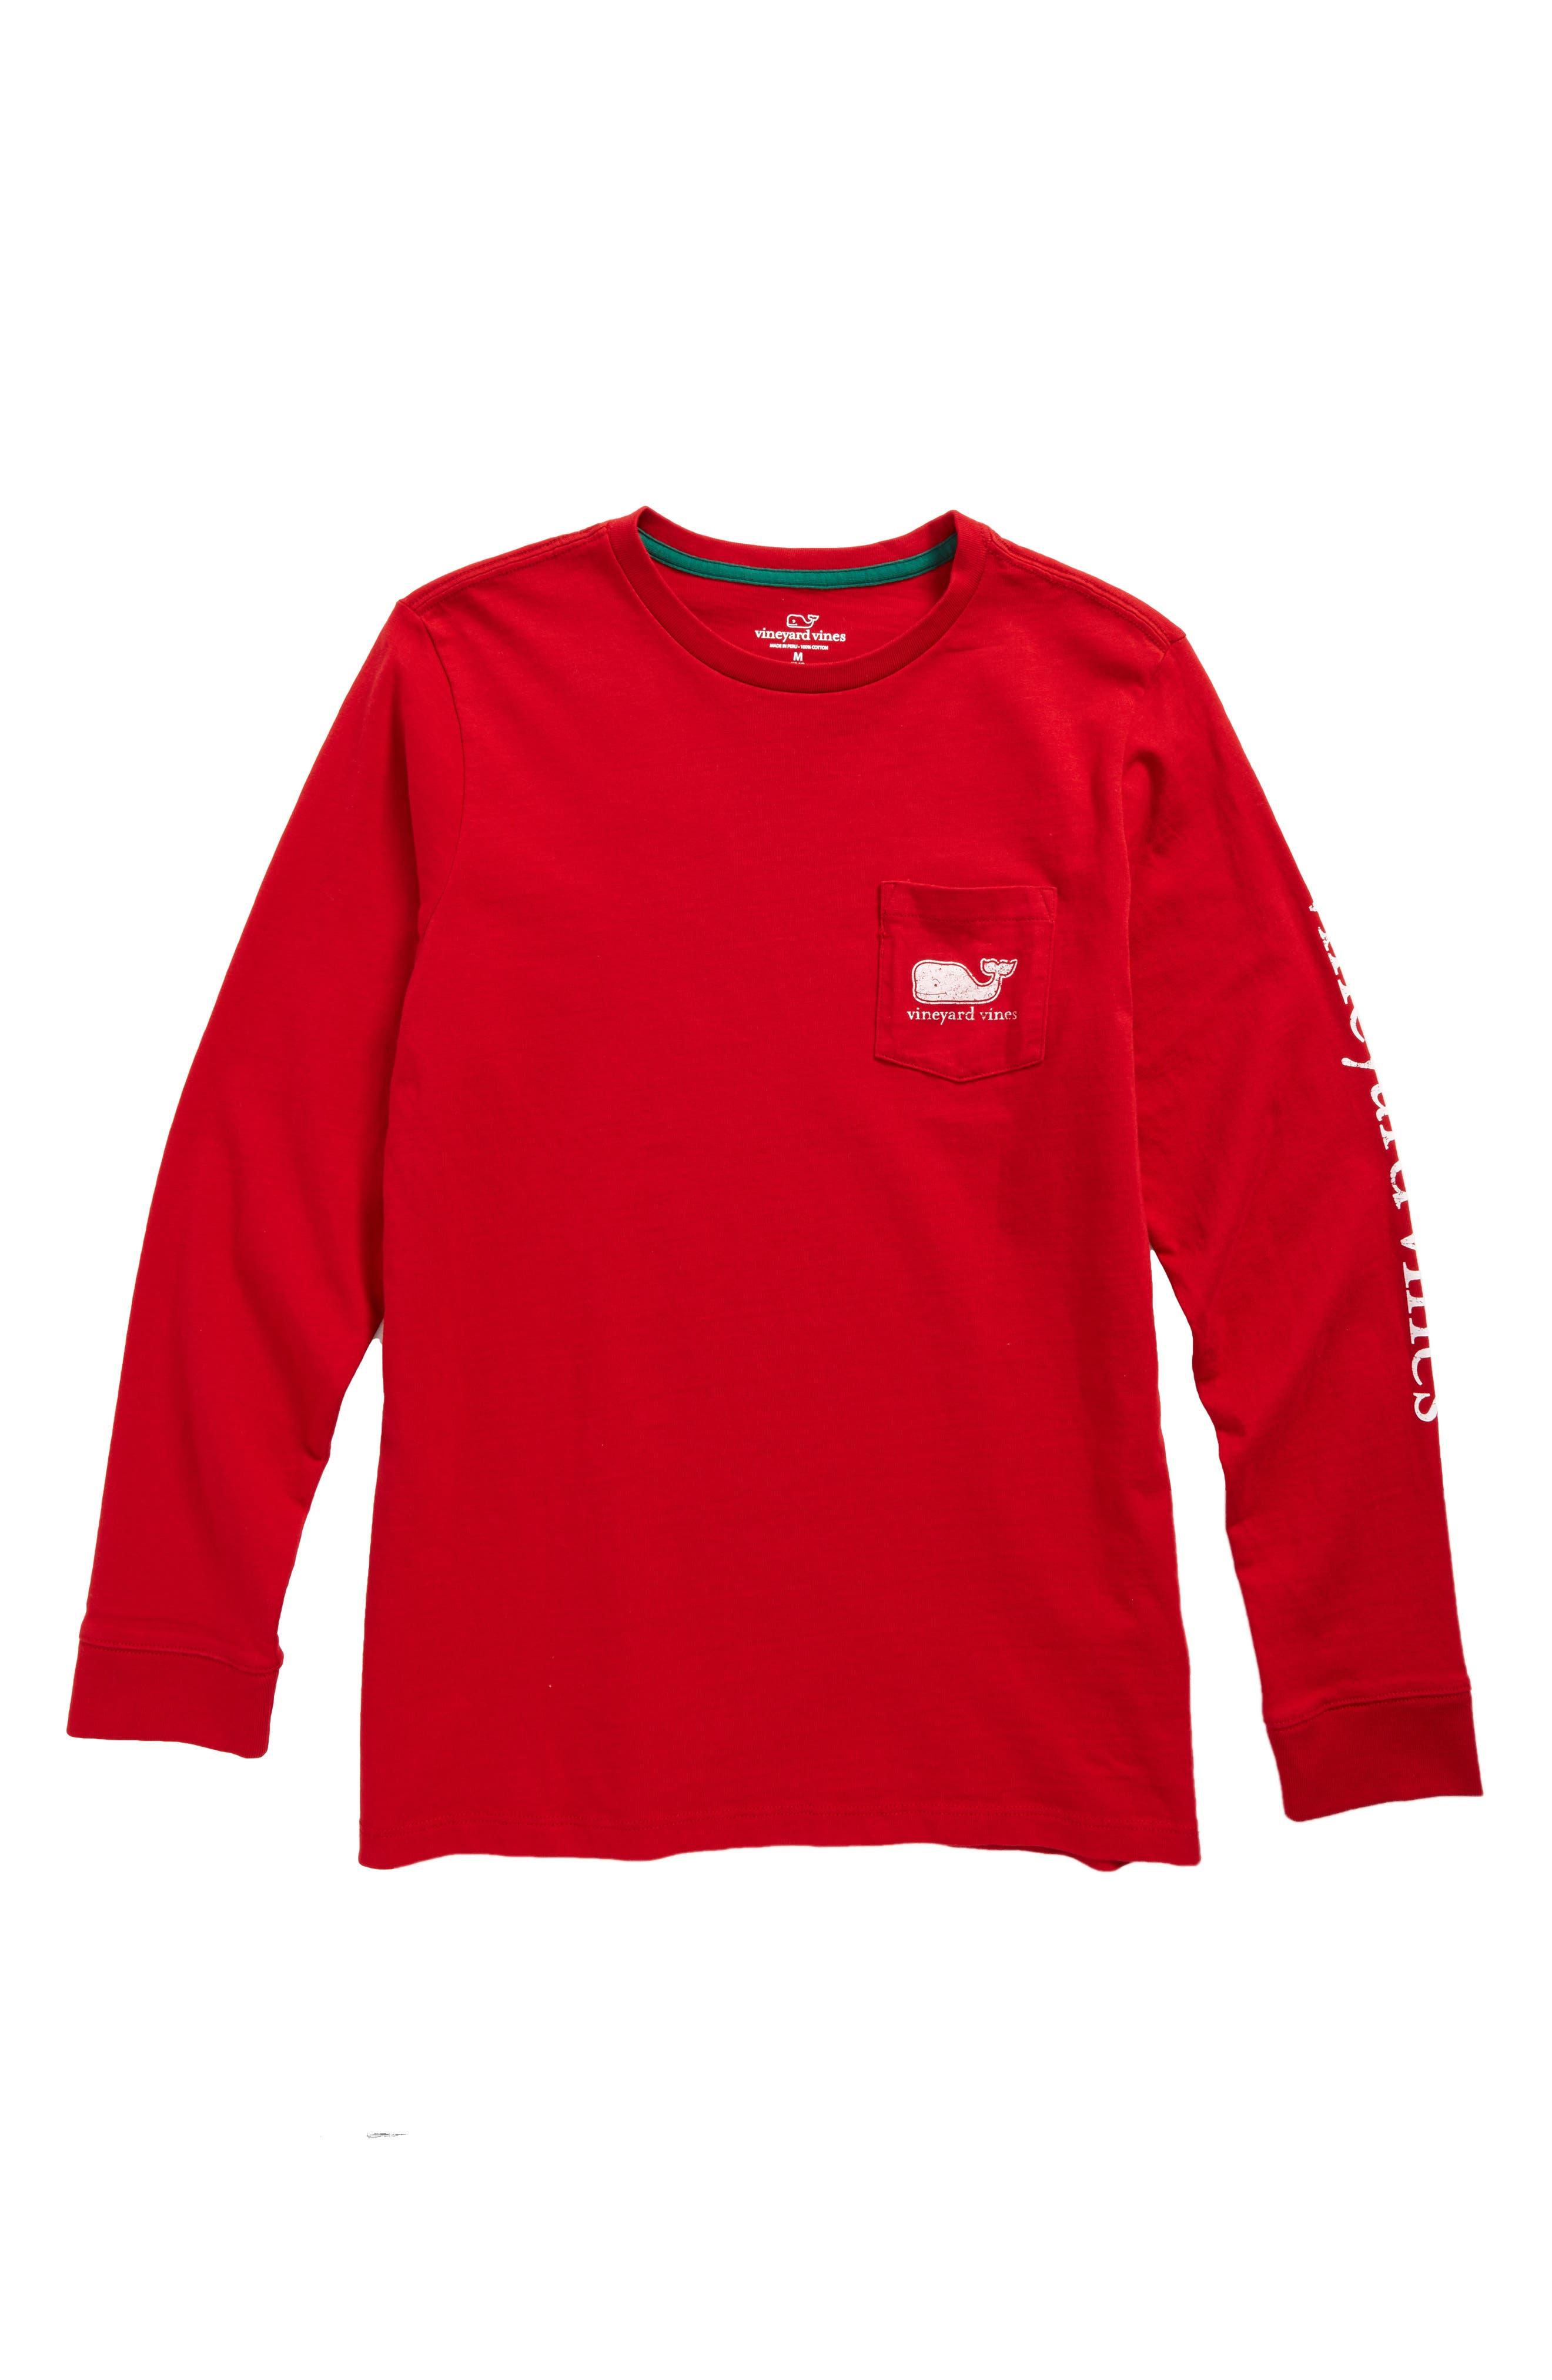 vineyard vines Vintage Whale Pocket T-Shirt (Big Boys)